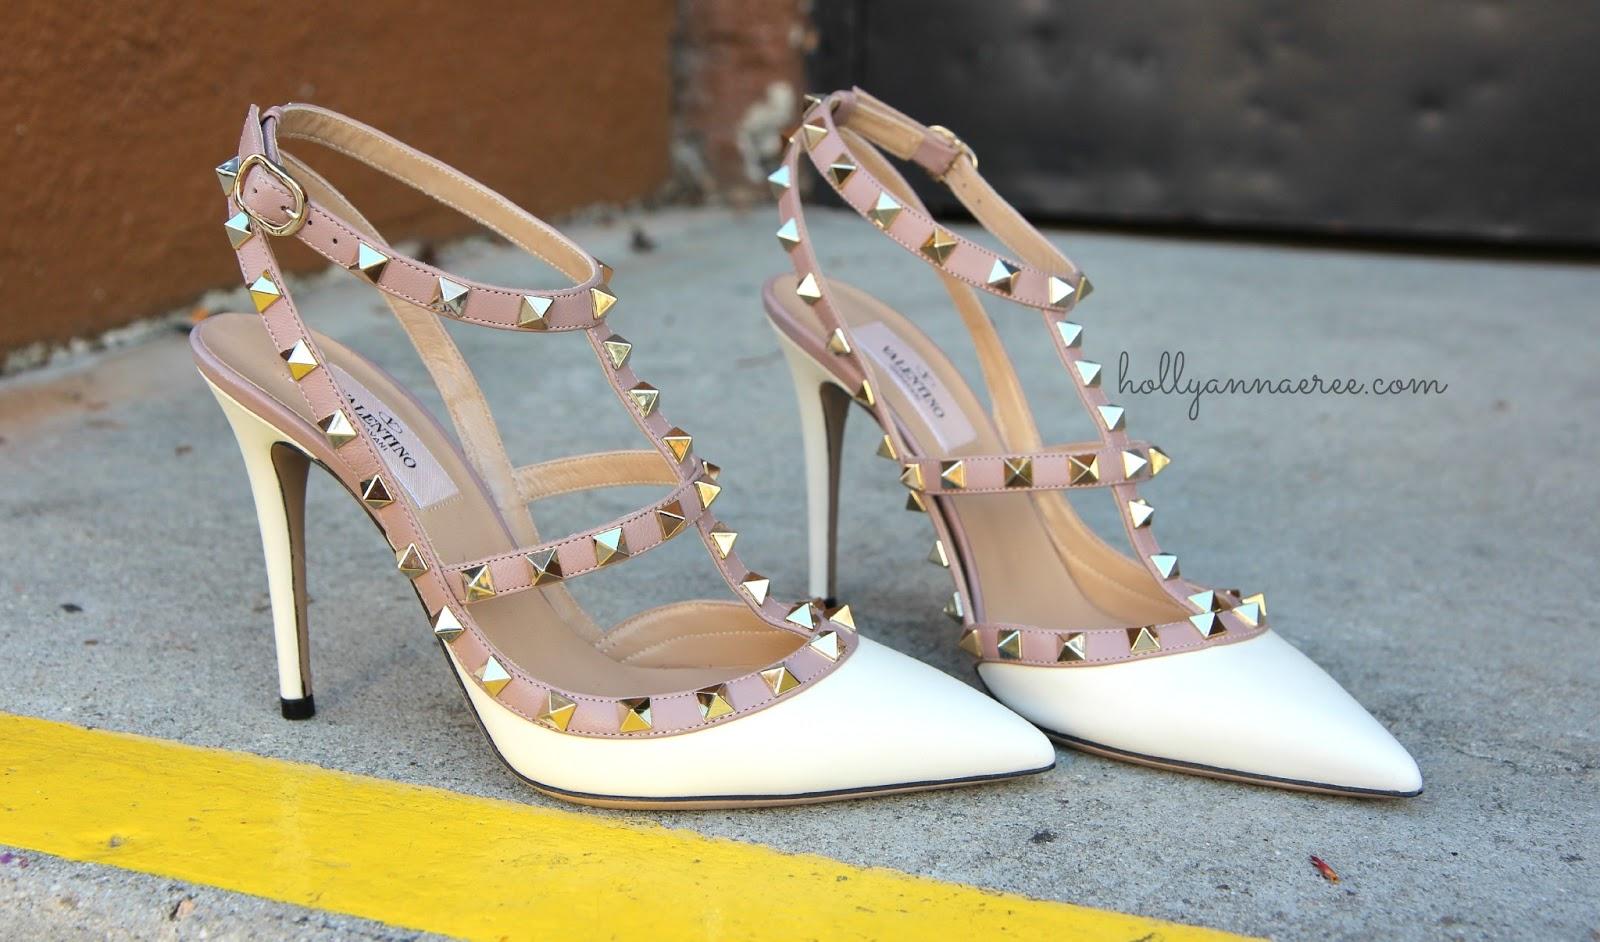 a9e08075df12 Holly Ann-AeRee 2.0   Fashion  Sneak Peek  Upcoming Shoe Reviews ...